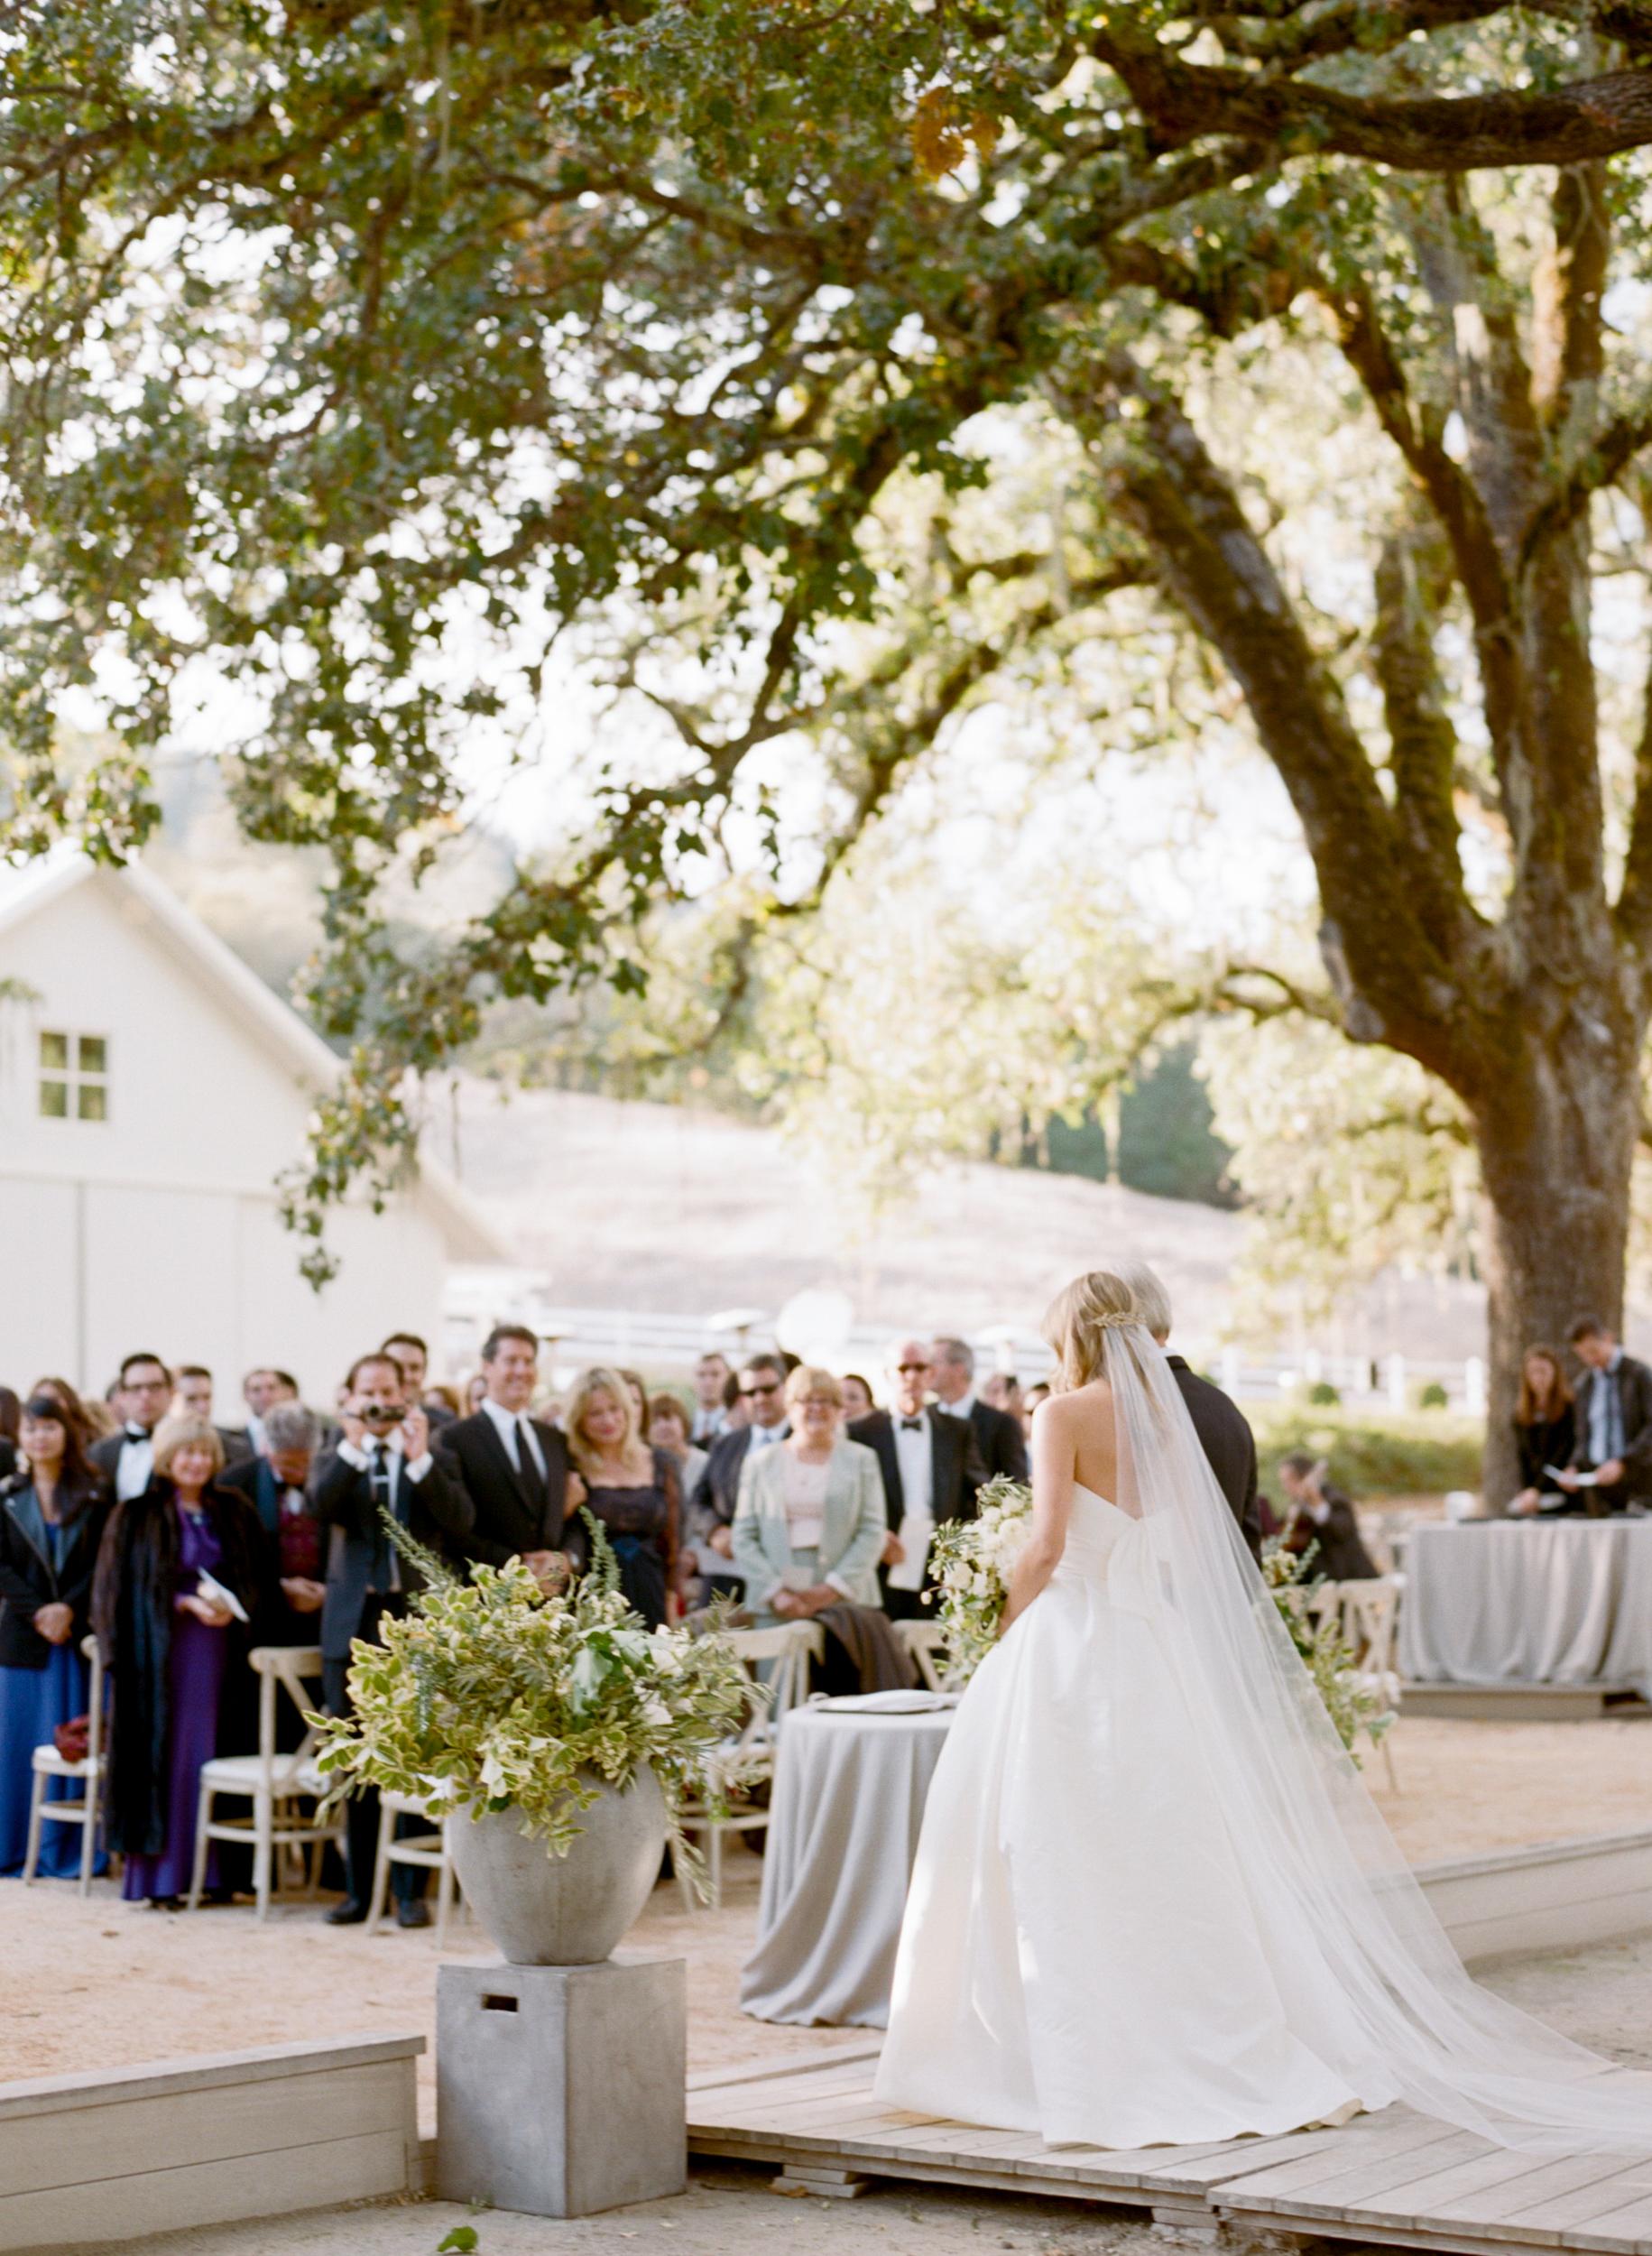 SylvieGil-Durham-Ranch-Organic-Ethereal-Rustic-Father-Aisle-Wedding